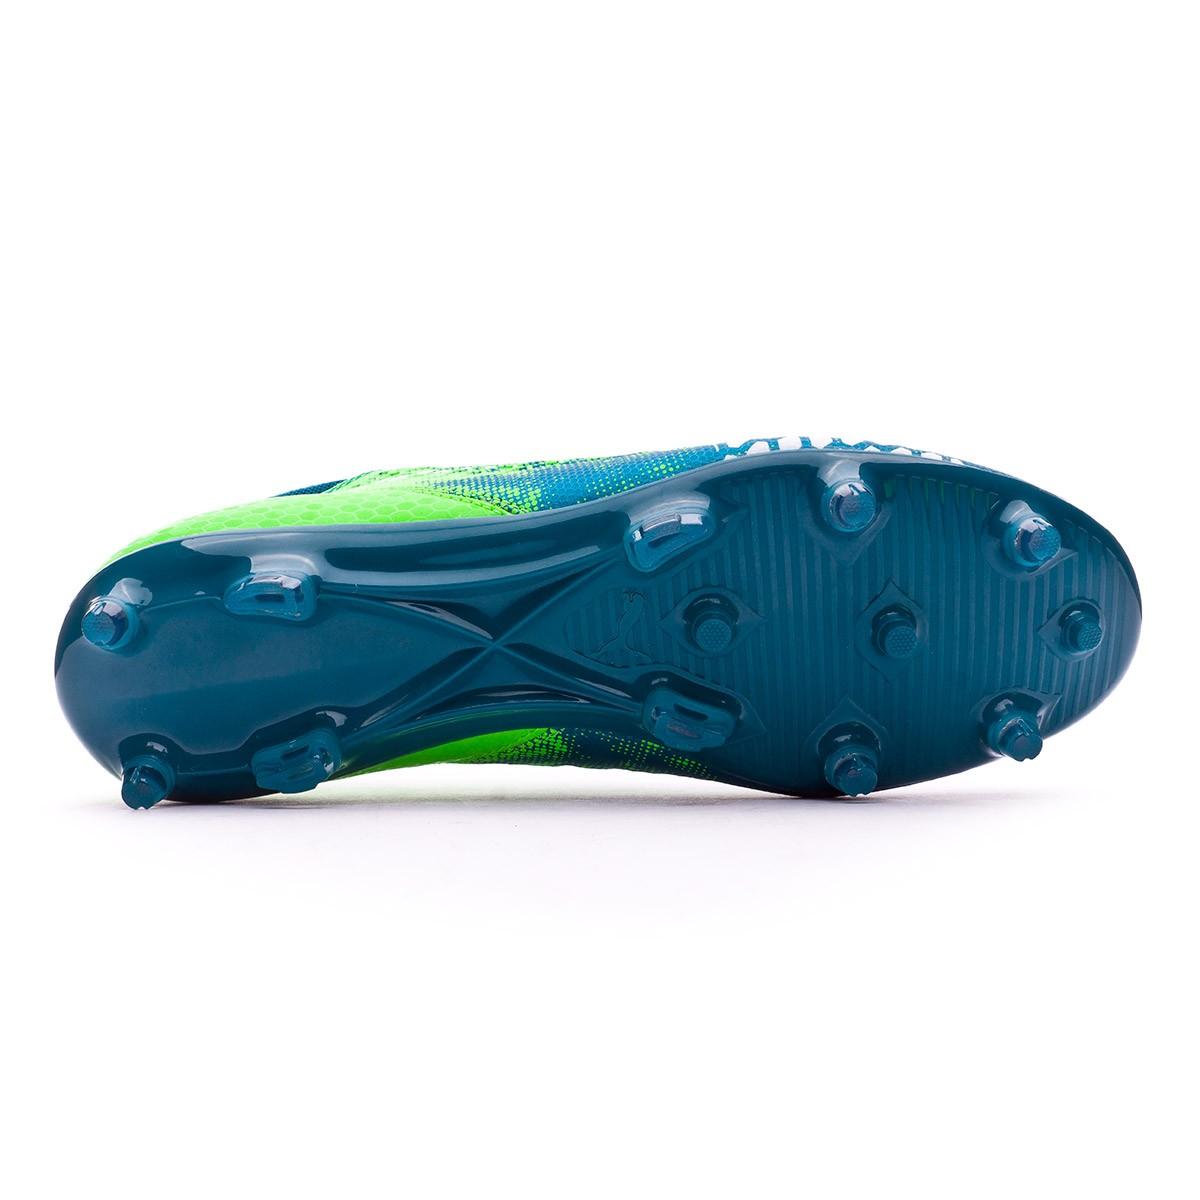 7d4b68c90 Bota de fútbol Puma Future 18.4 hyFG Deep Lagoon-Puma white-Green gecko -  Tienda de fútbol Fútbol Emotion